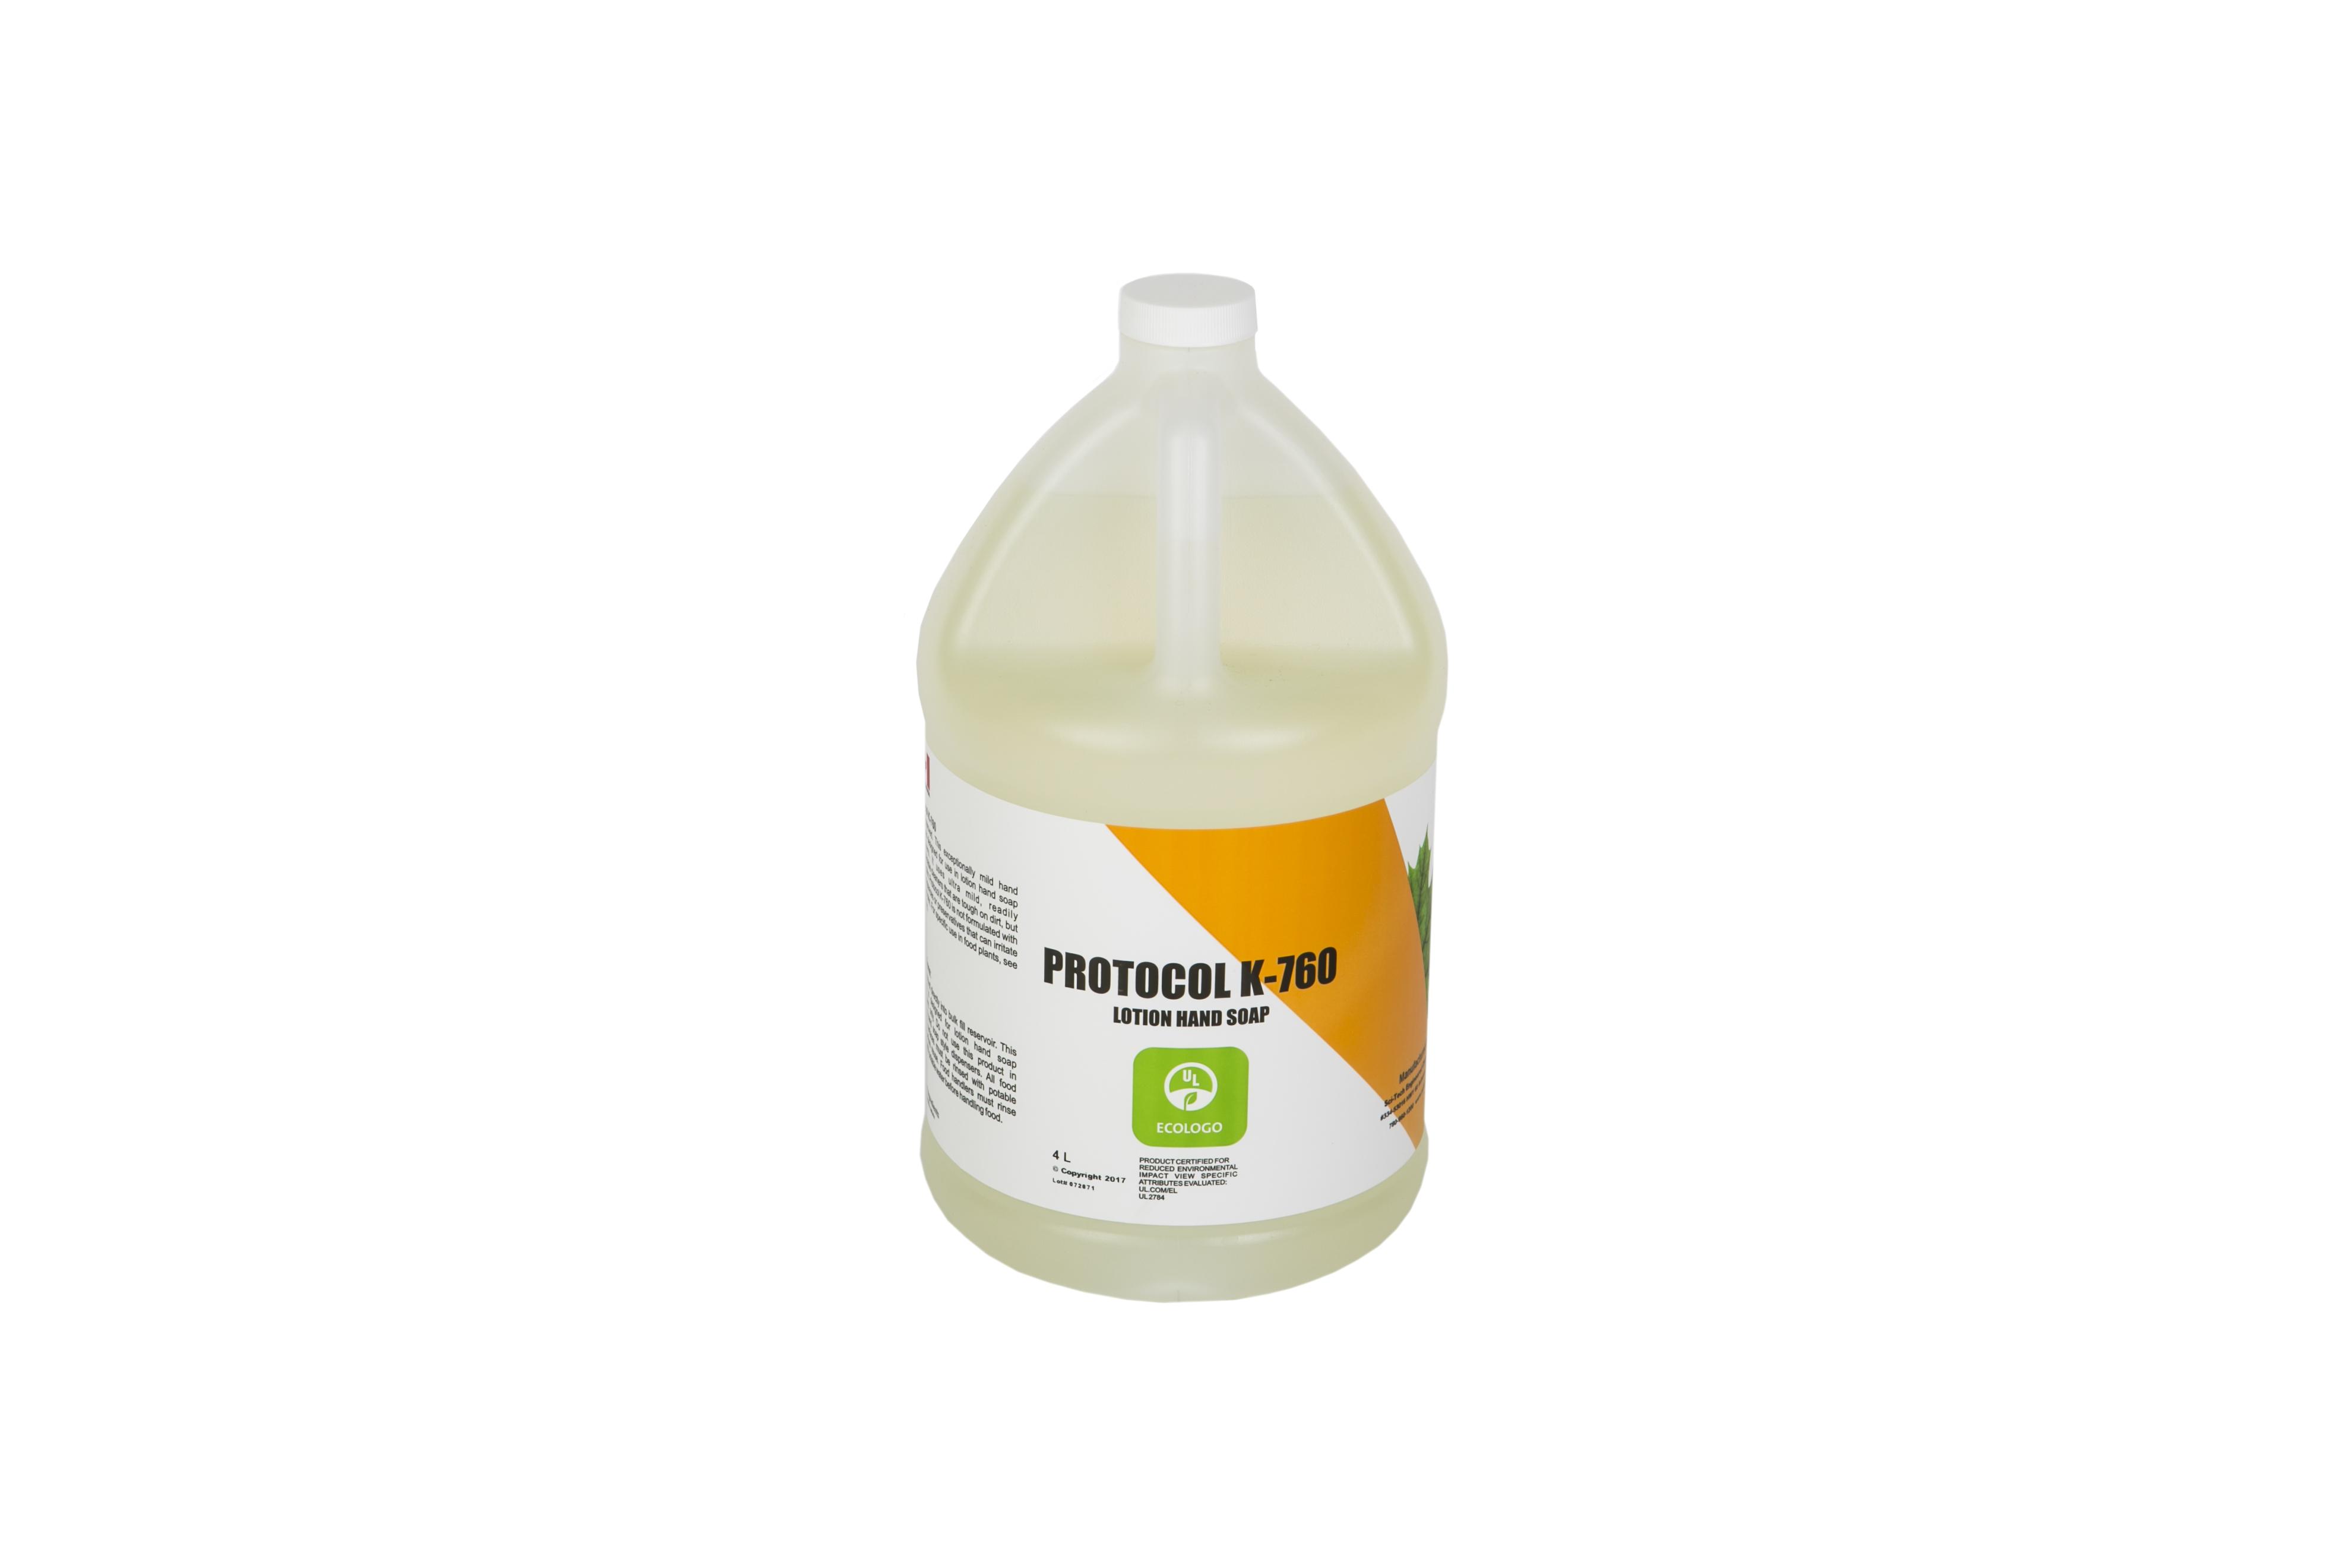 Protocol K760 UL Eco Certified Lotion Hand Soap - 4 Litre